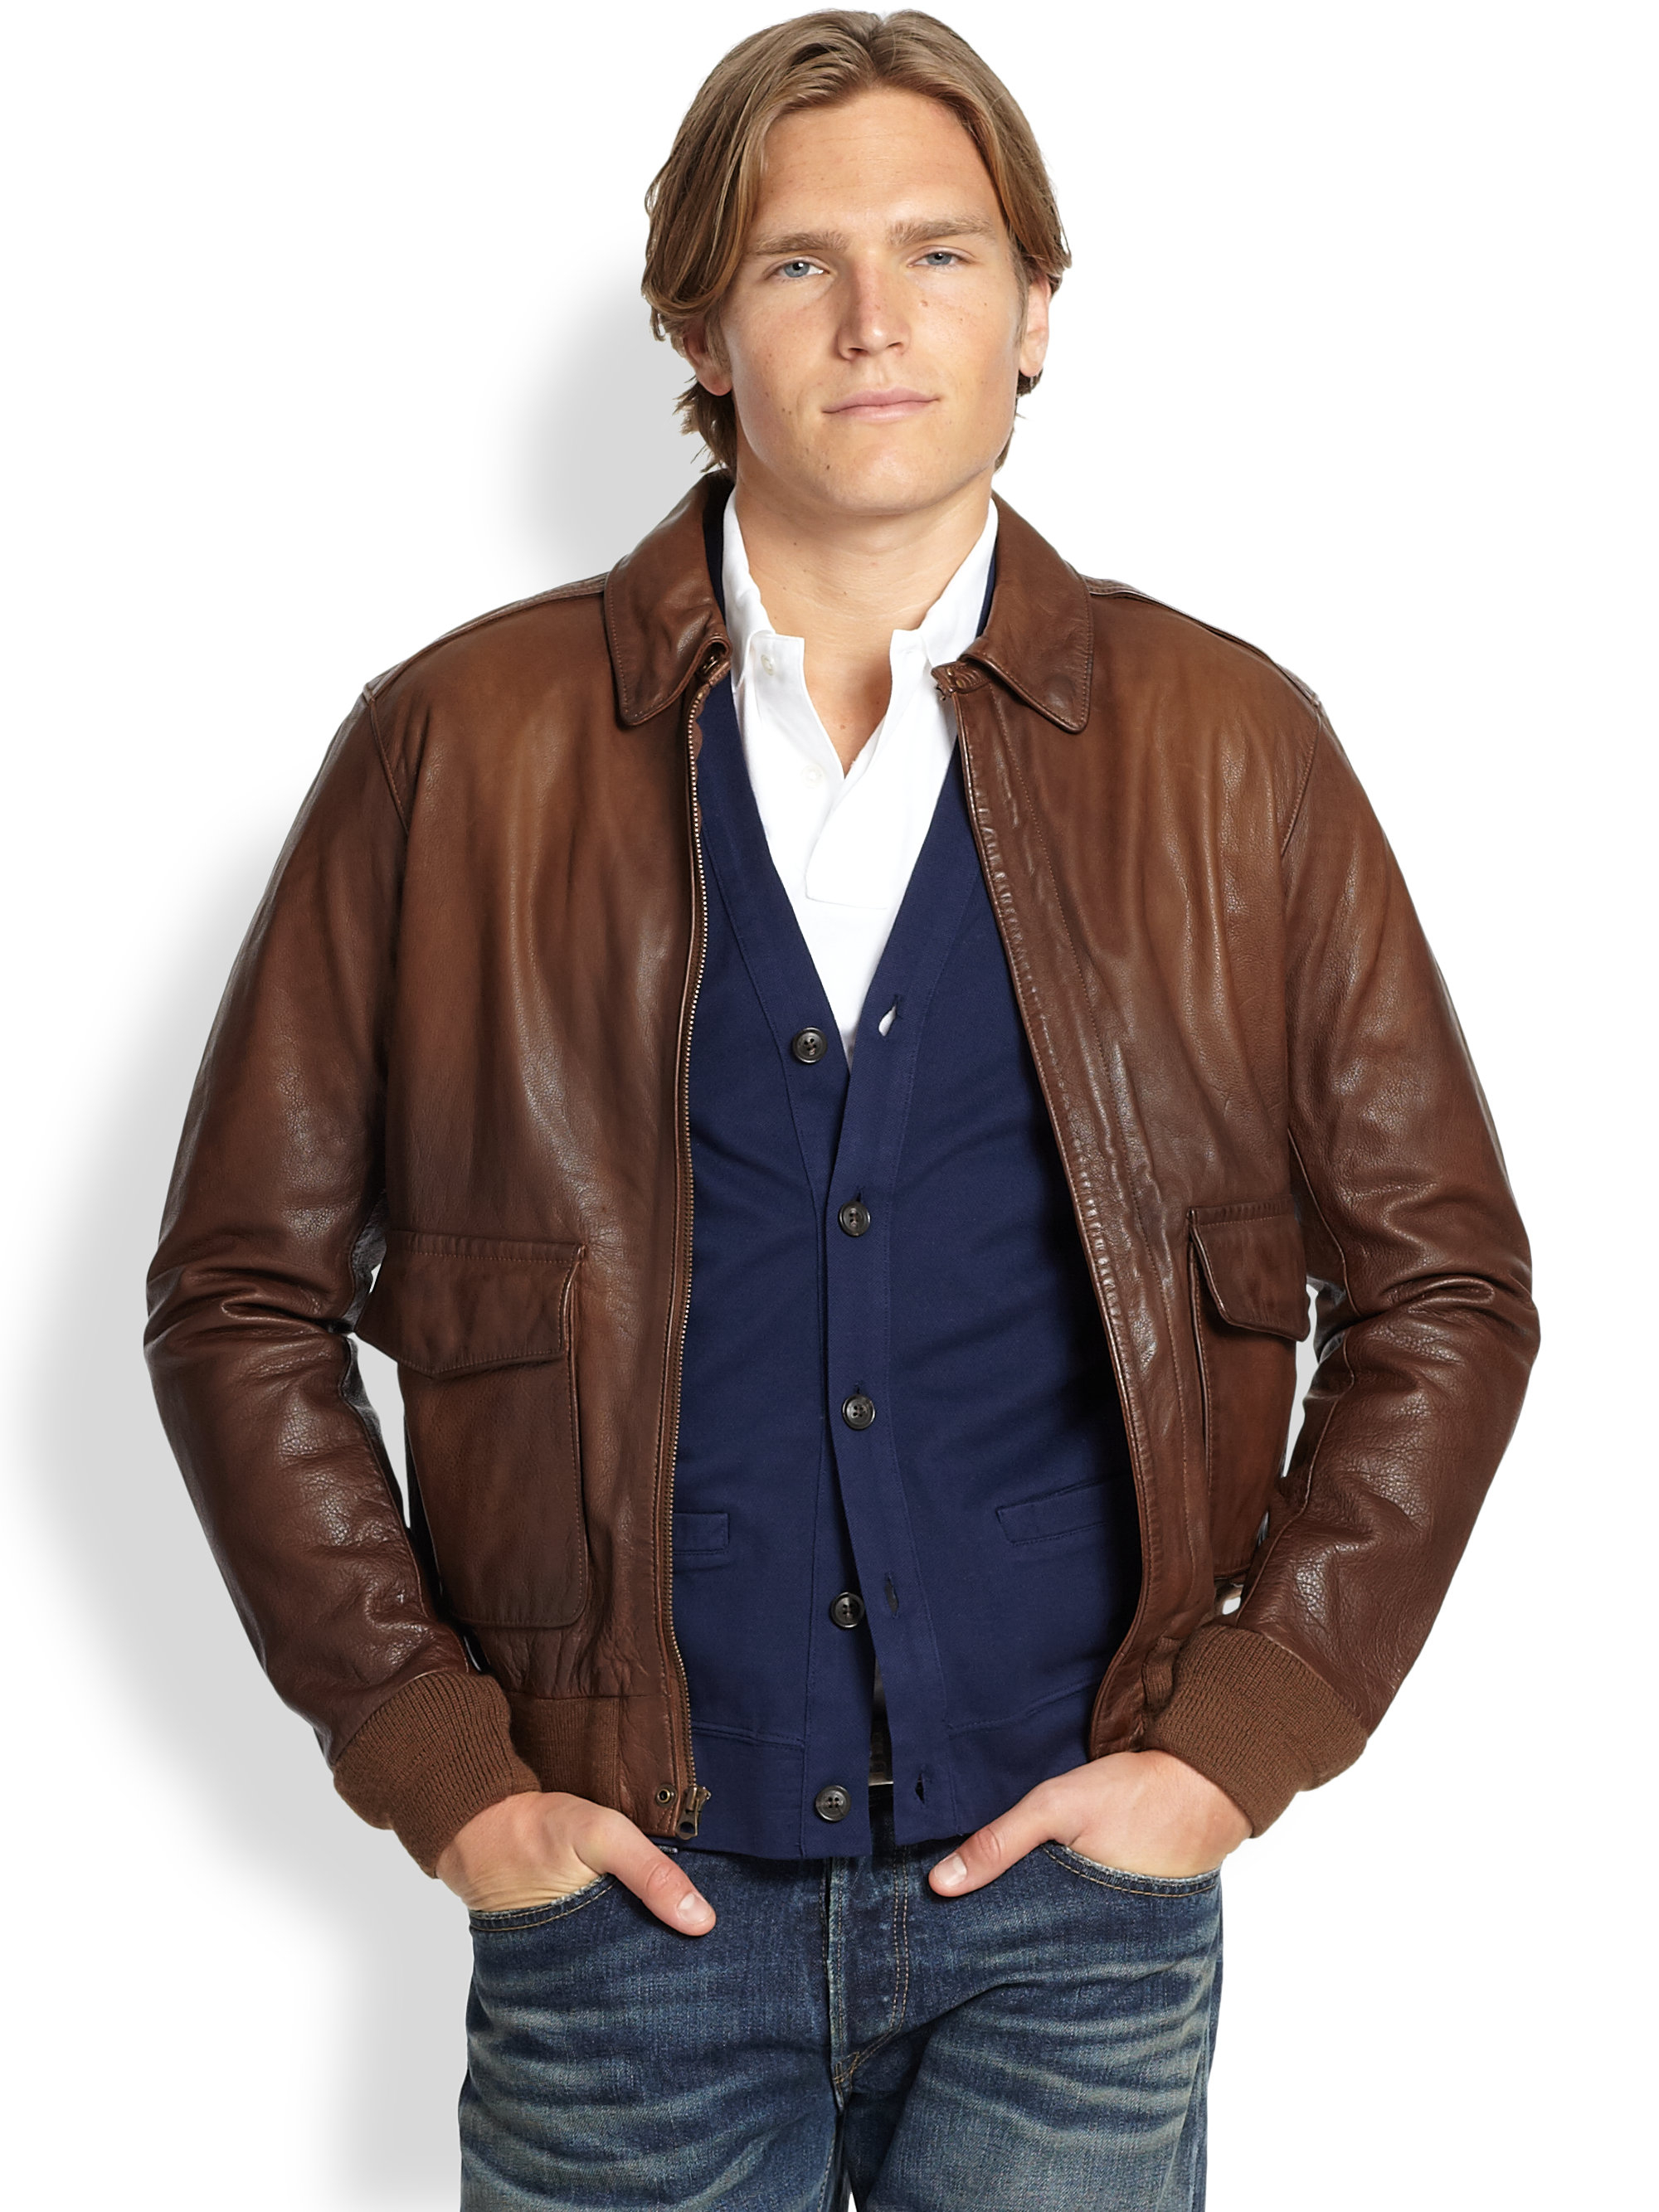 Ralph Lauren Fashion Show At New York: Polo Ralph Lauren Farrington Bomber Jacket In Brown